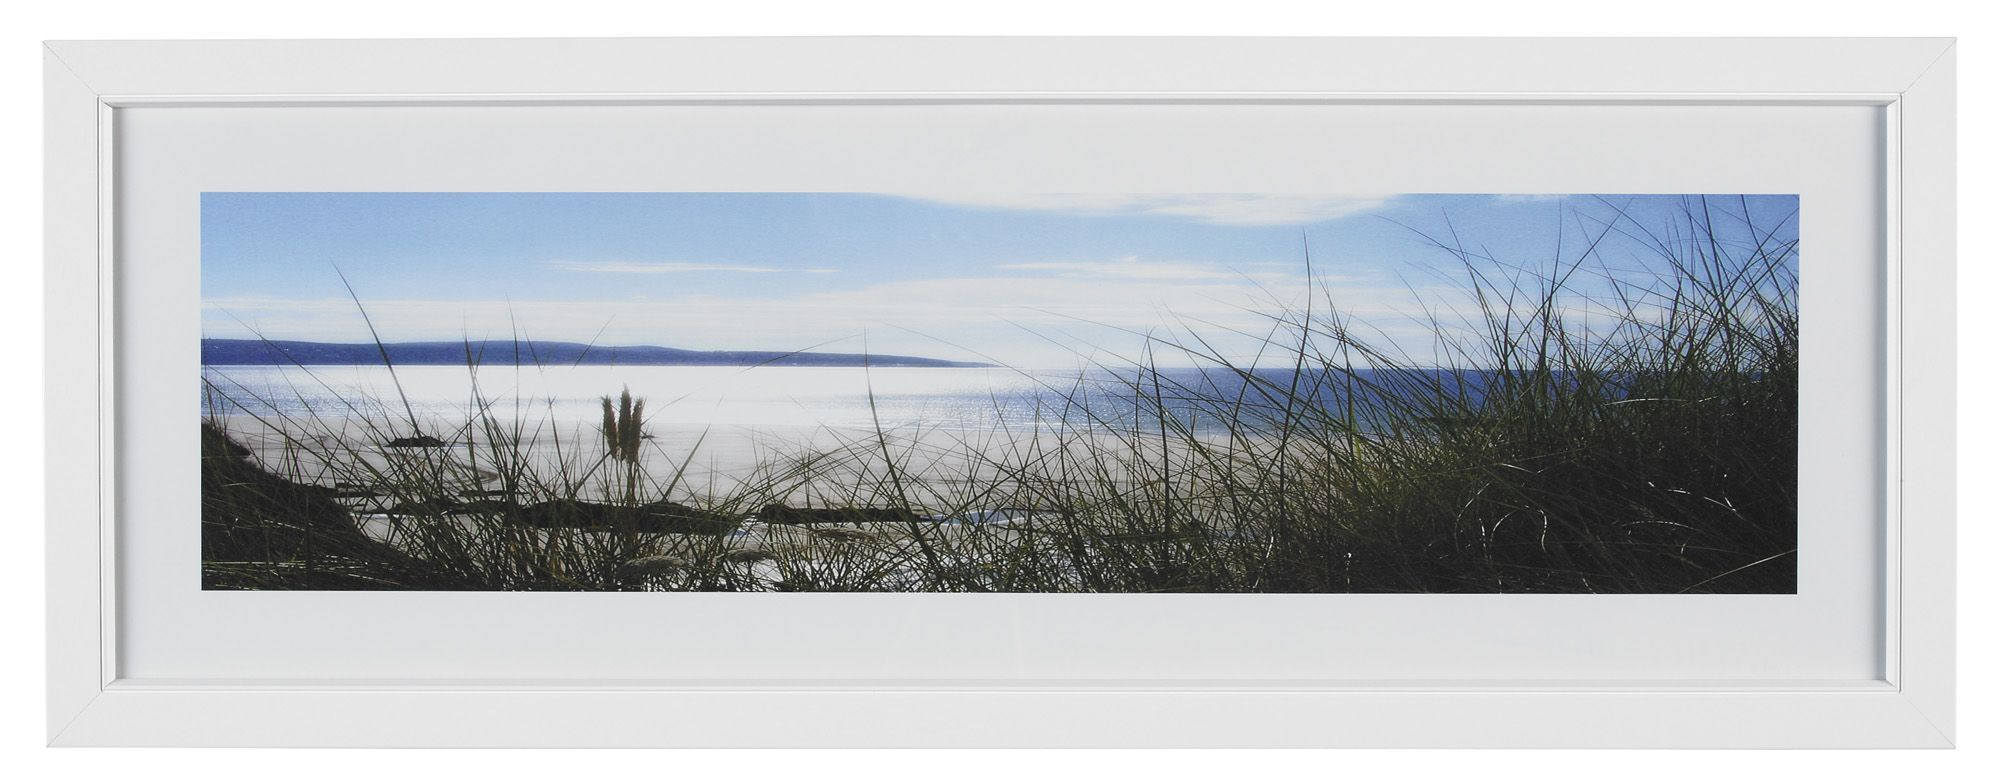 Through The Grasses Framed Print | Departments | DIY at B&Q